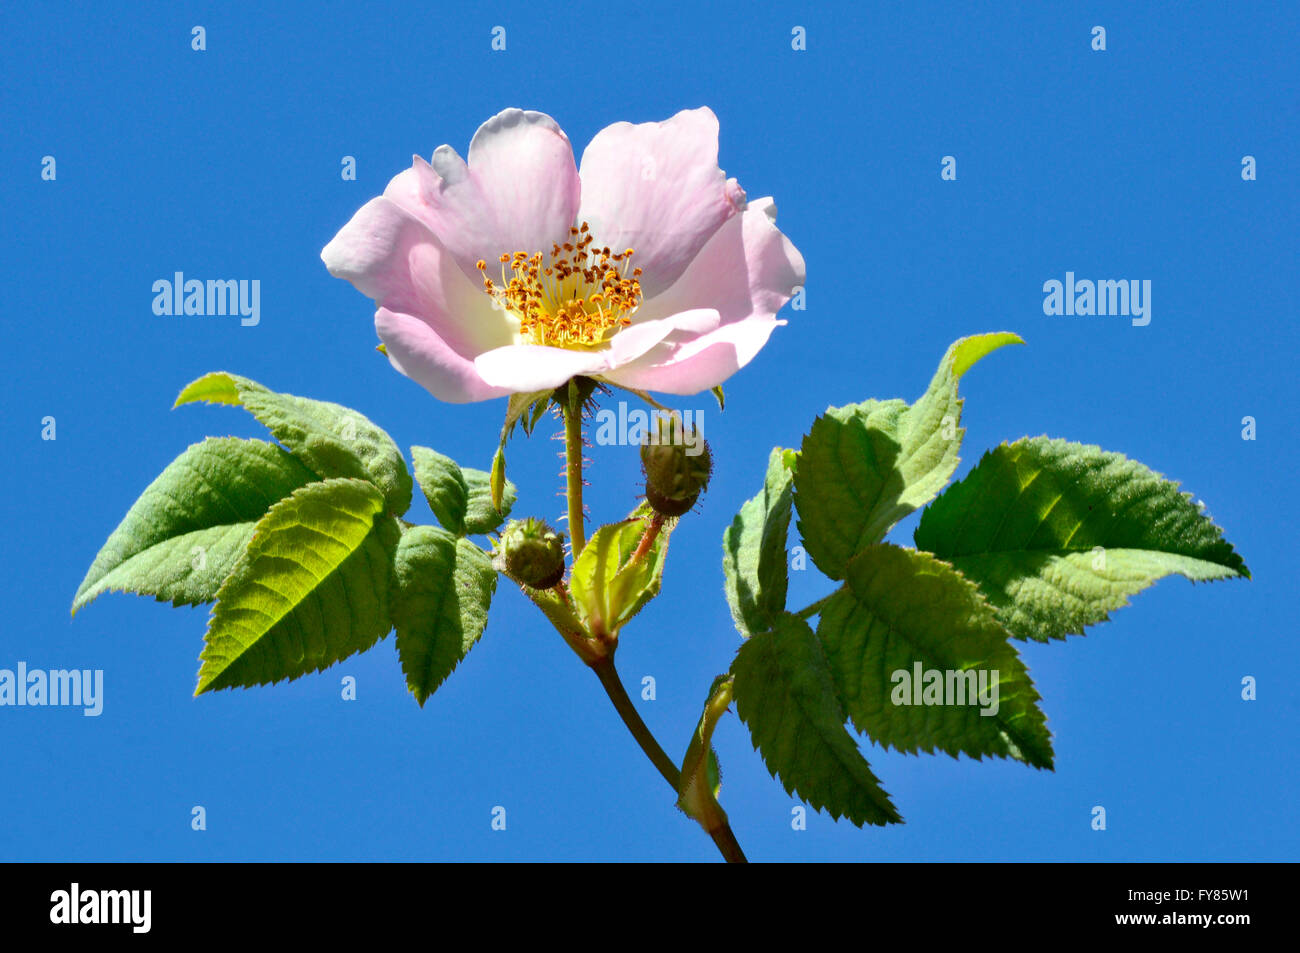 Closeup Dog rose (Rosa canina) flower on blue sky background Stock Photo